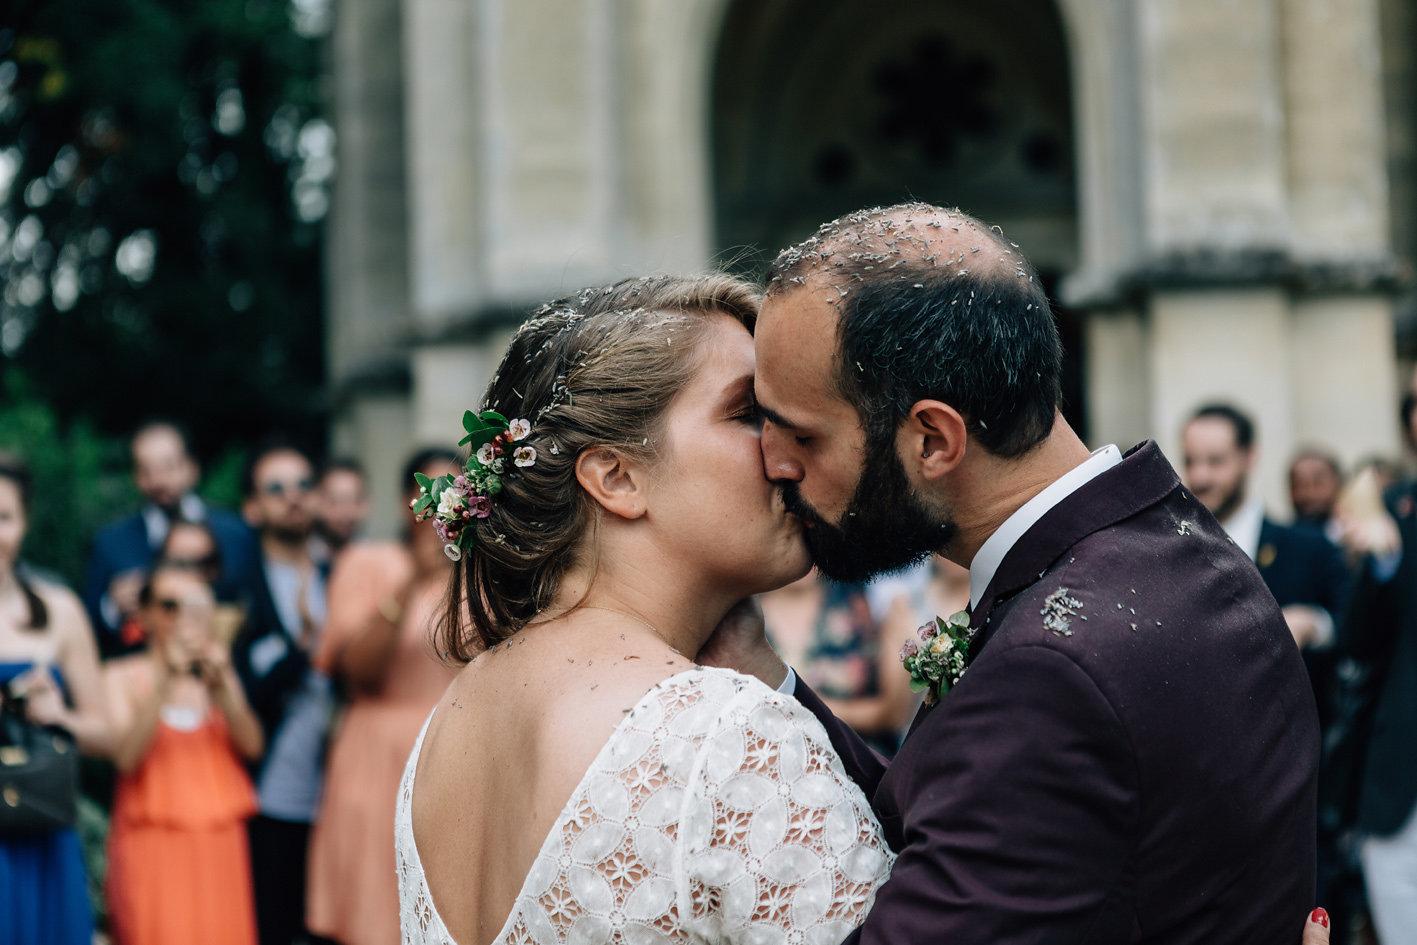 pierreatelier-photographe-mariage-paris-orangeriedevatimesnil-325.jpg